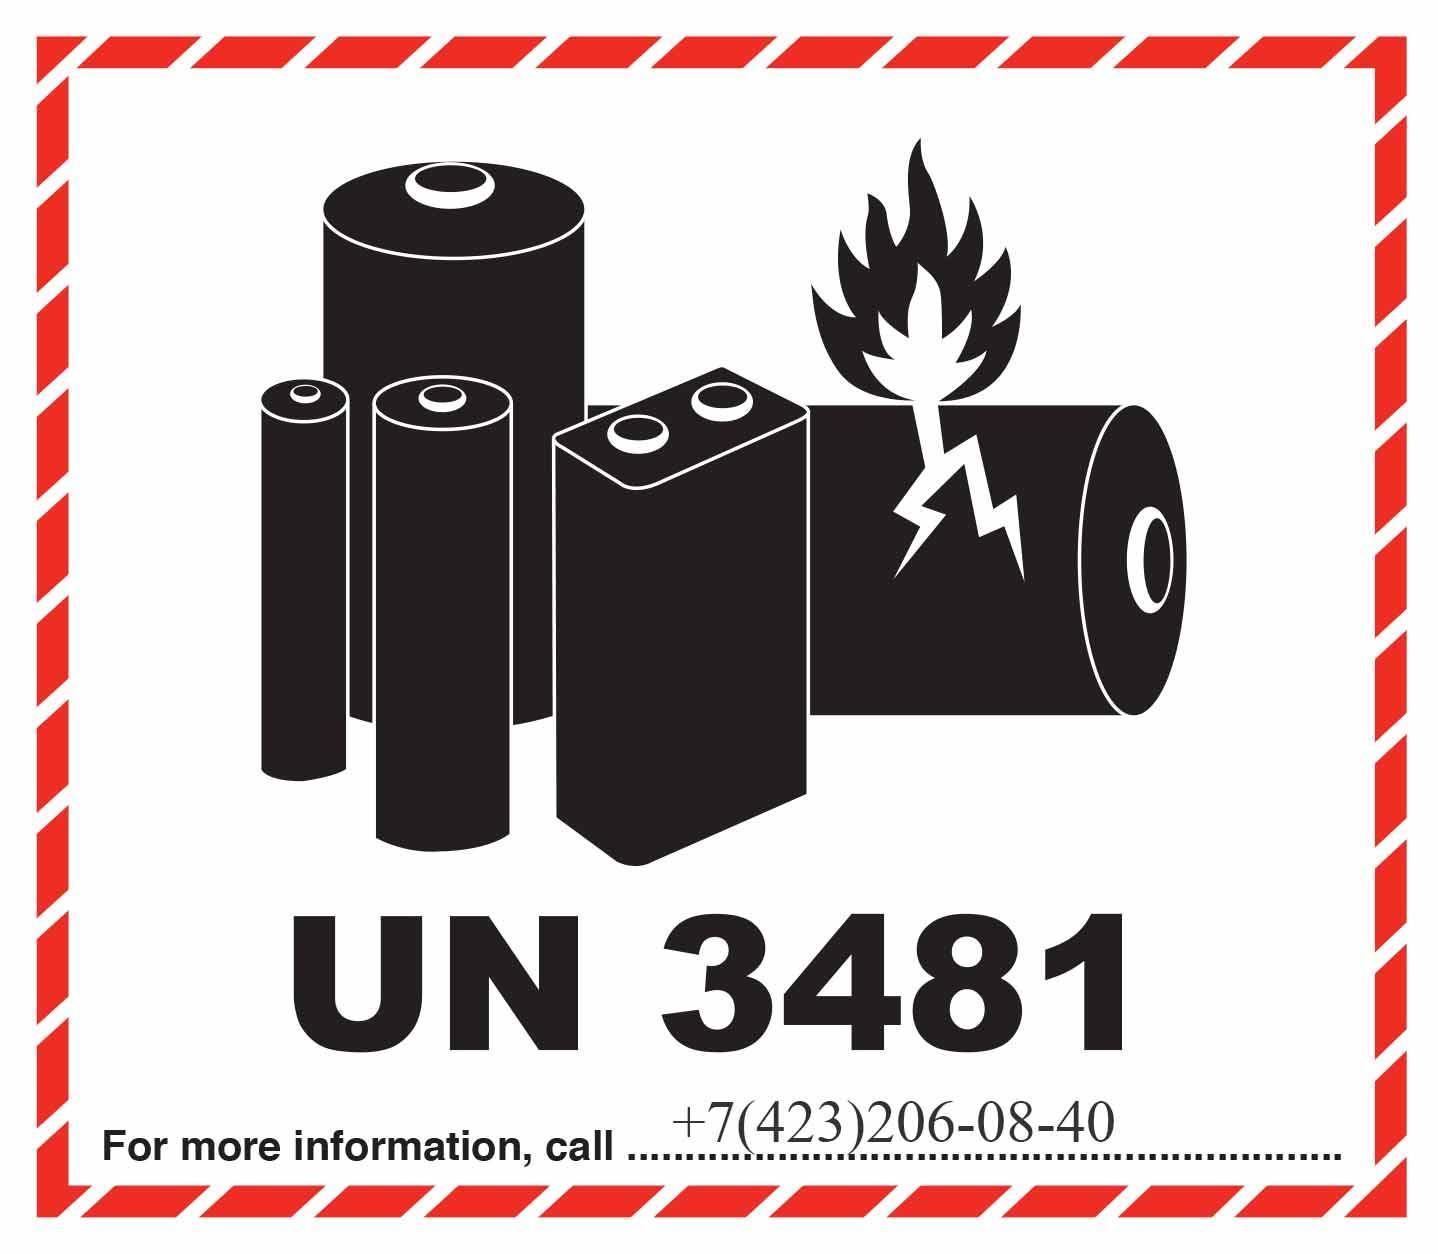 ZN 3481